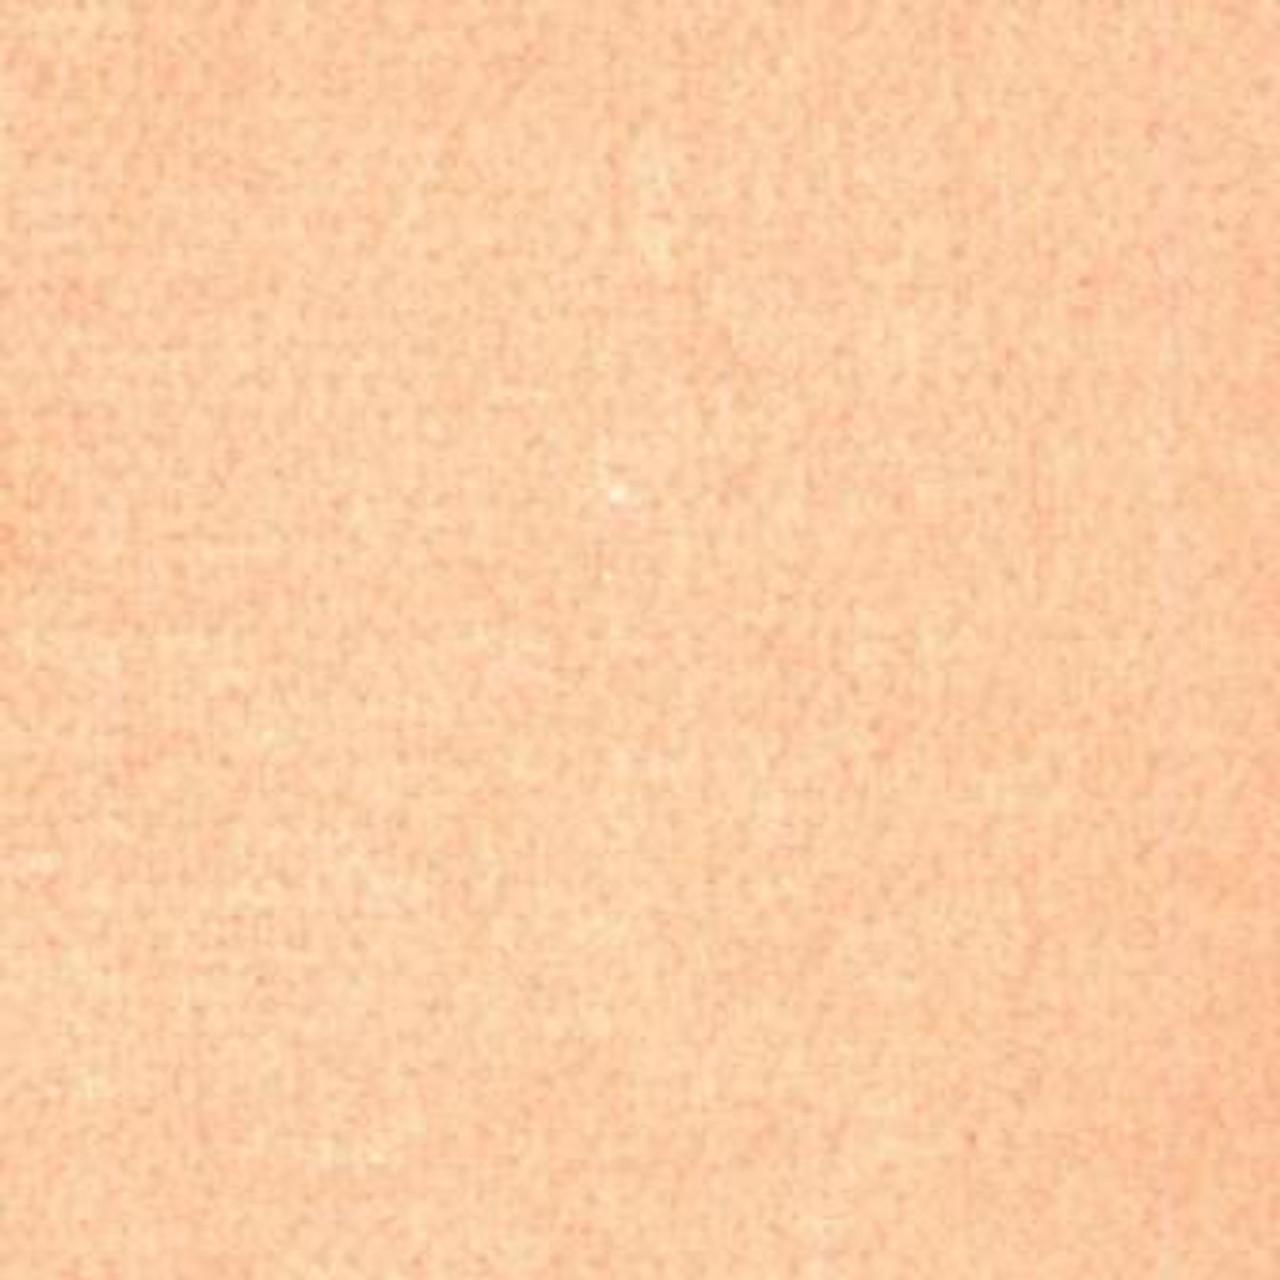 NC2036L - Large Peach Mist Carpet